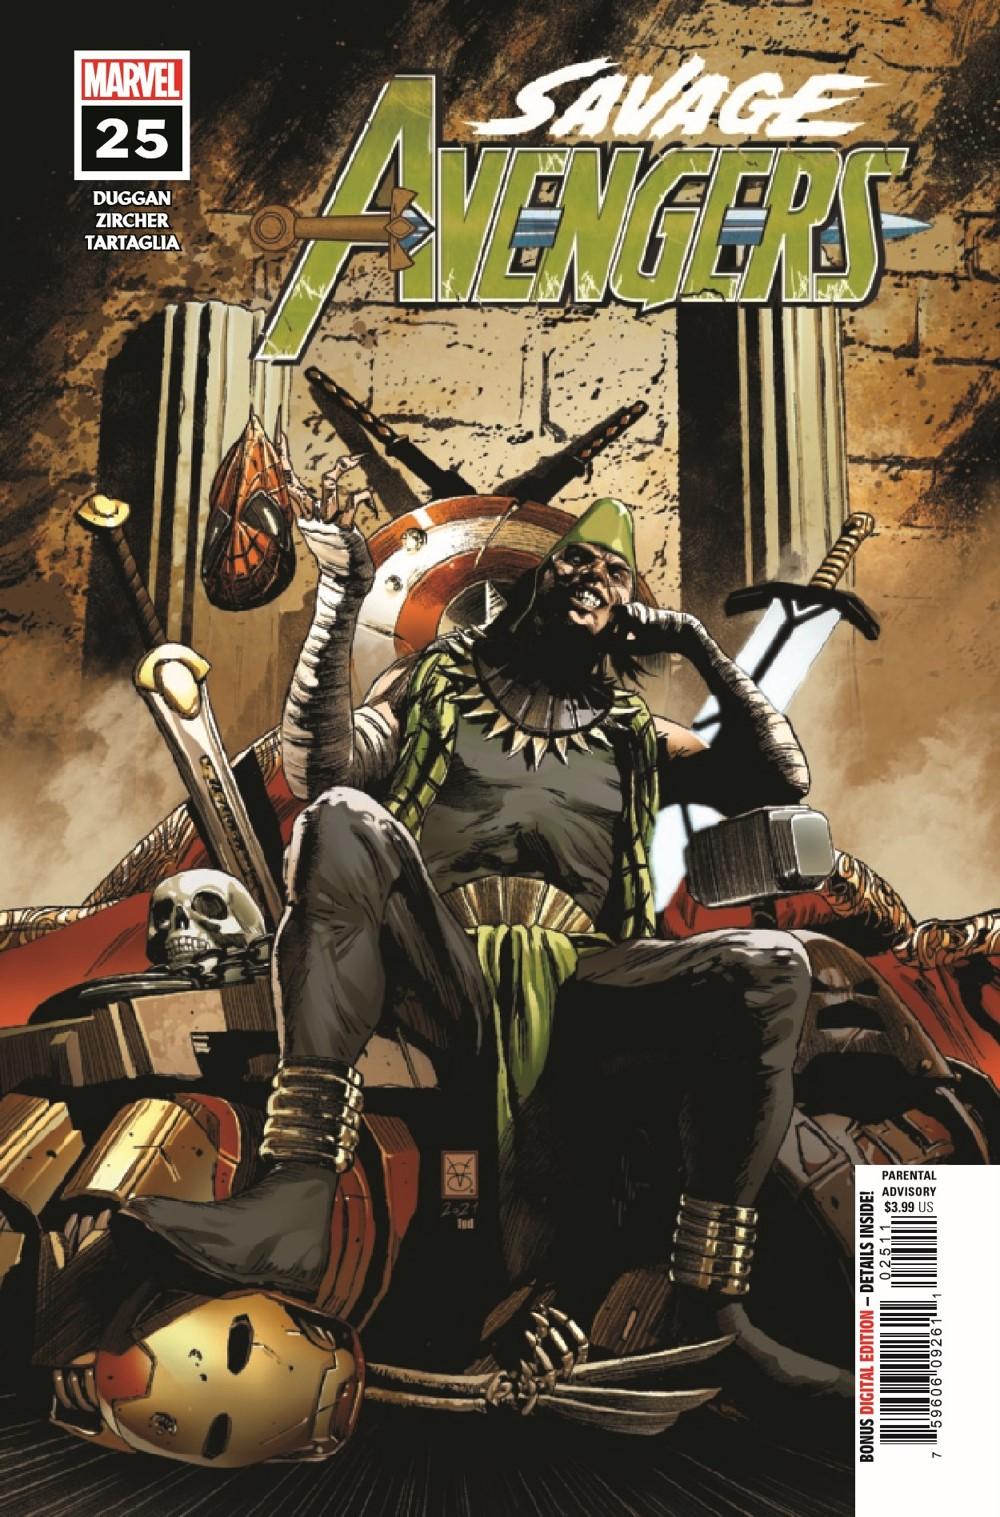 SAVAVEN2019025_Preview-1 ComicList Previews: SAVAGE AVENGERS #25